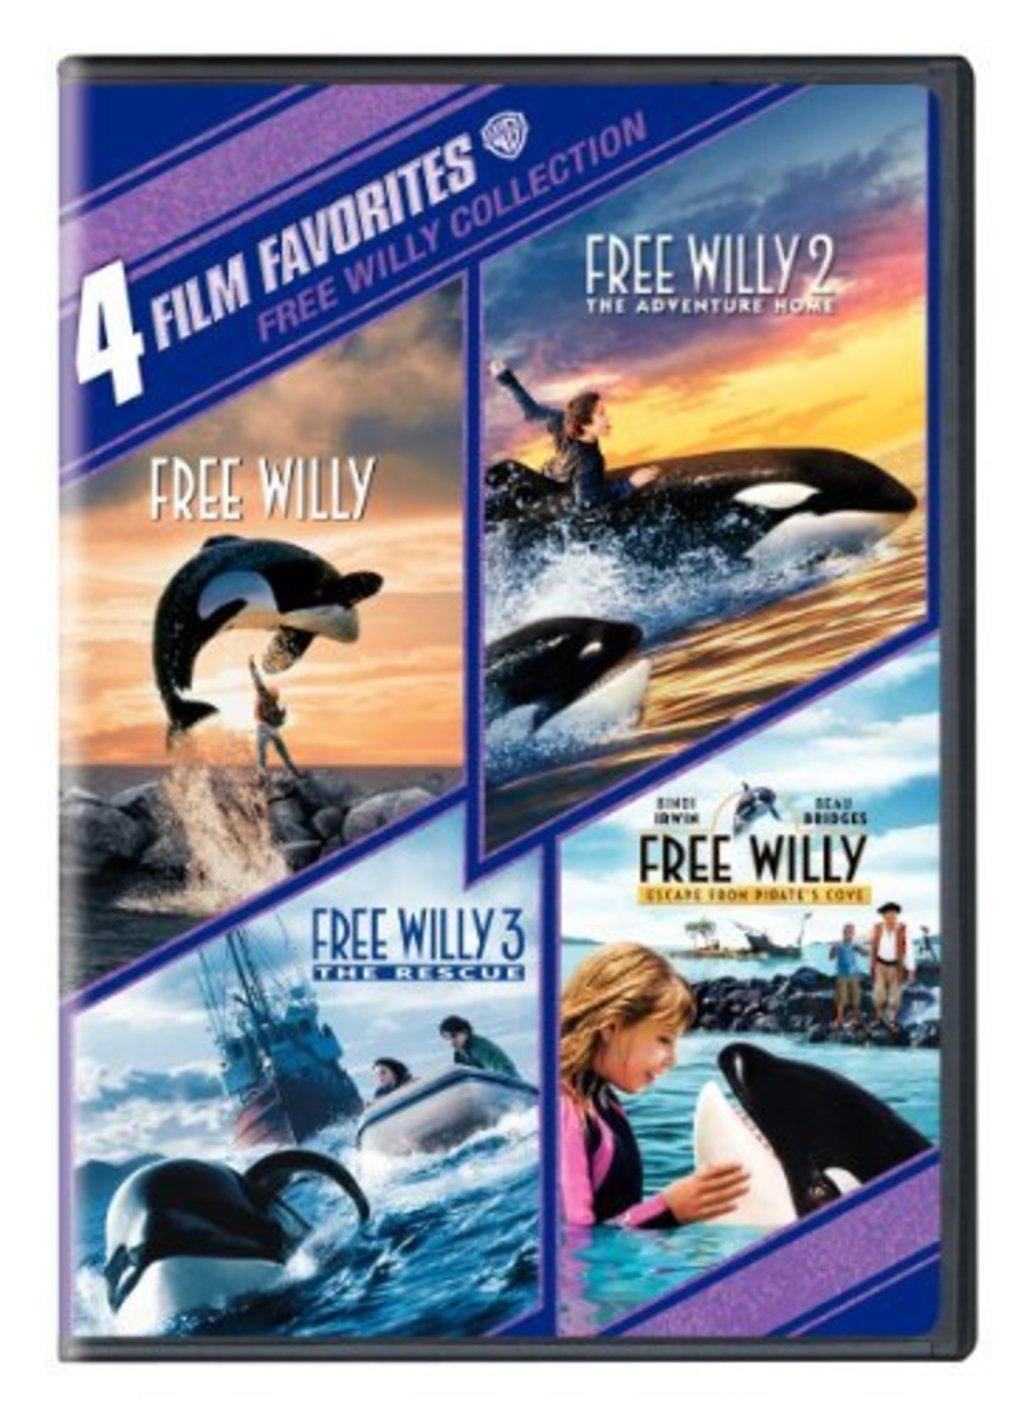 Watch Free Willy On Netflix Today Netflixmovies Com